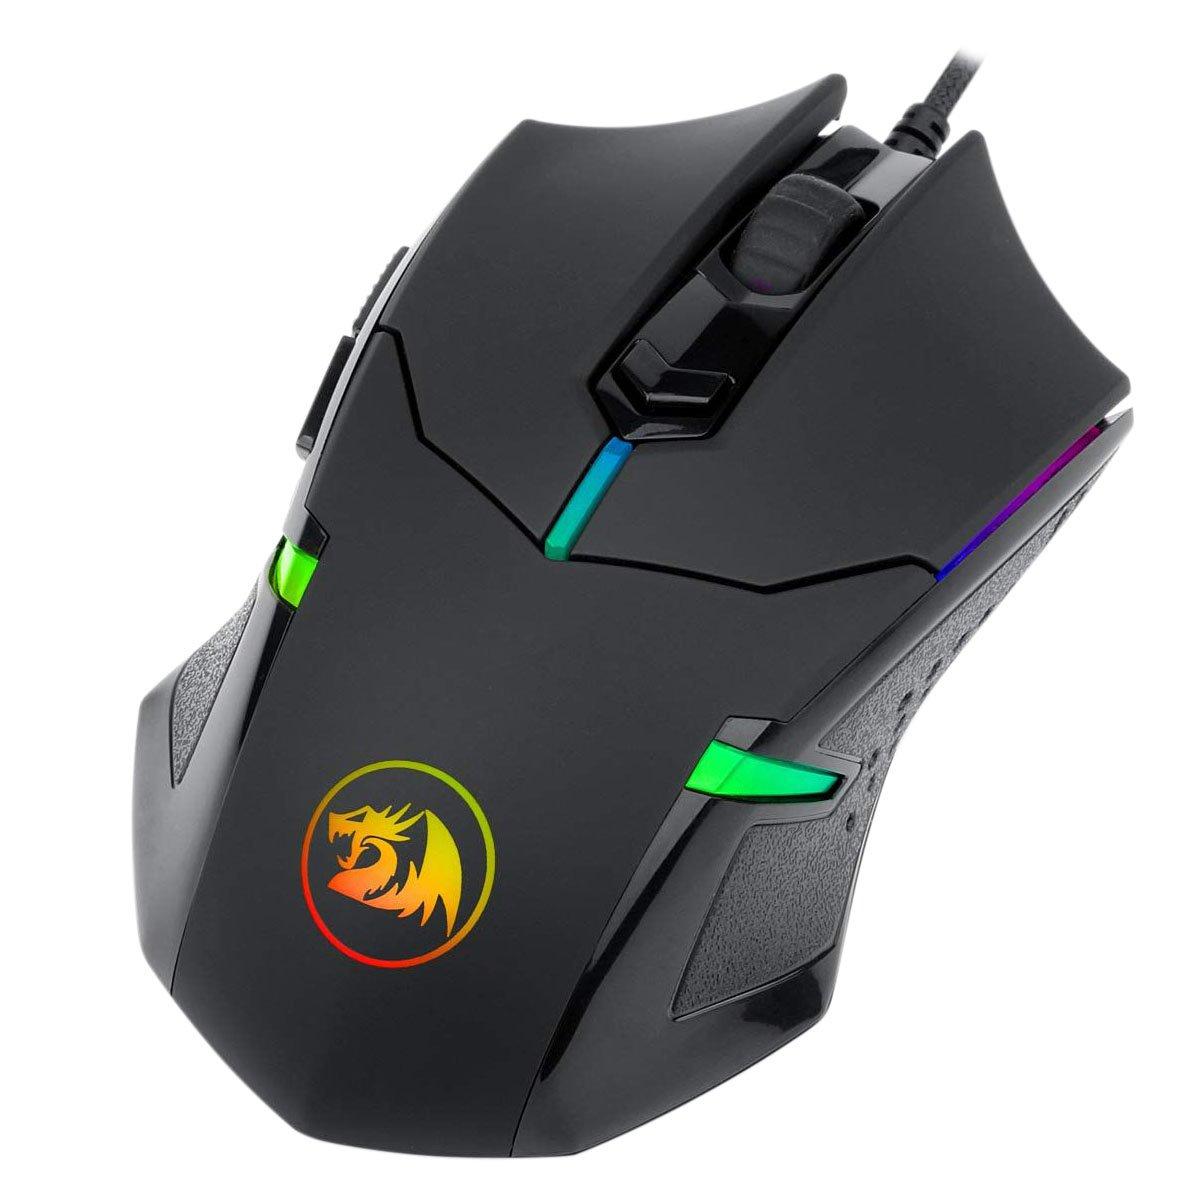 mouse usb gamer redragon centrophorus 2 m601 rgb 7200dpi preto 50953 2000 202845